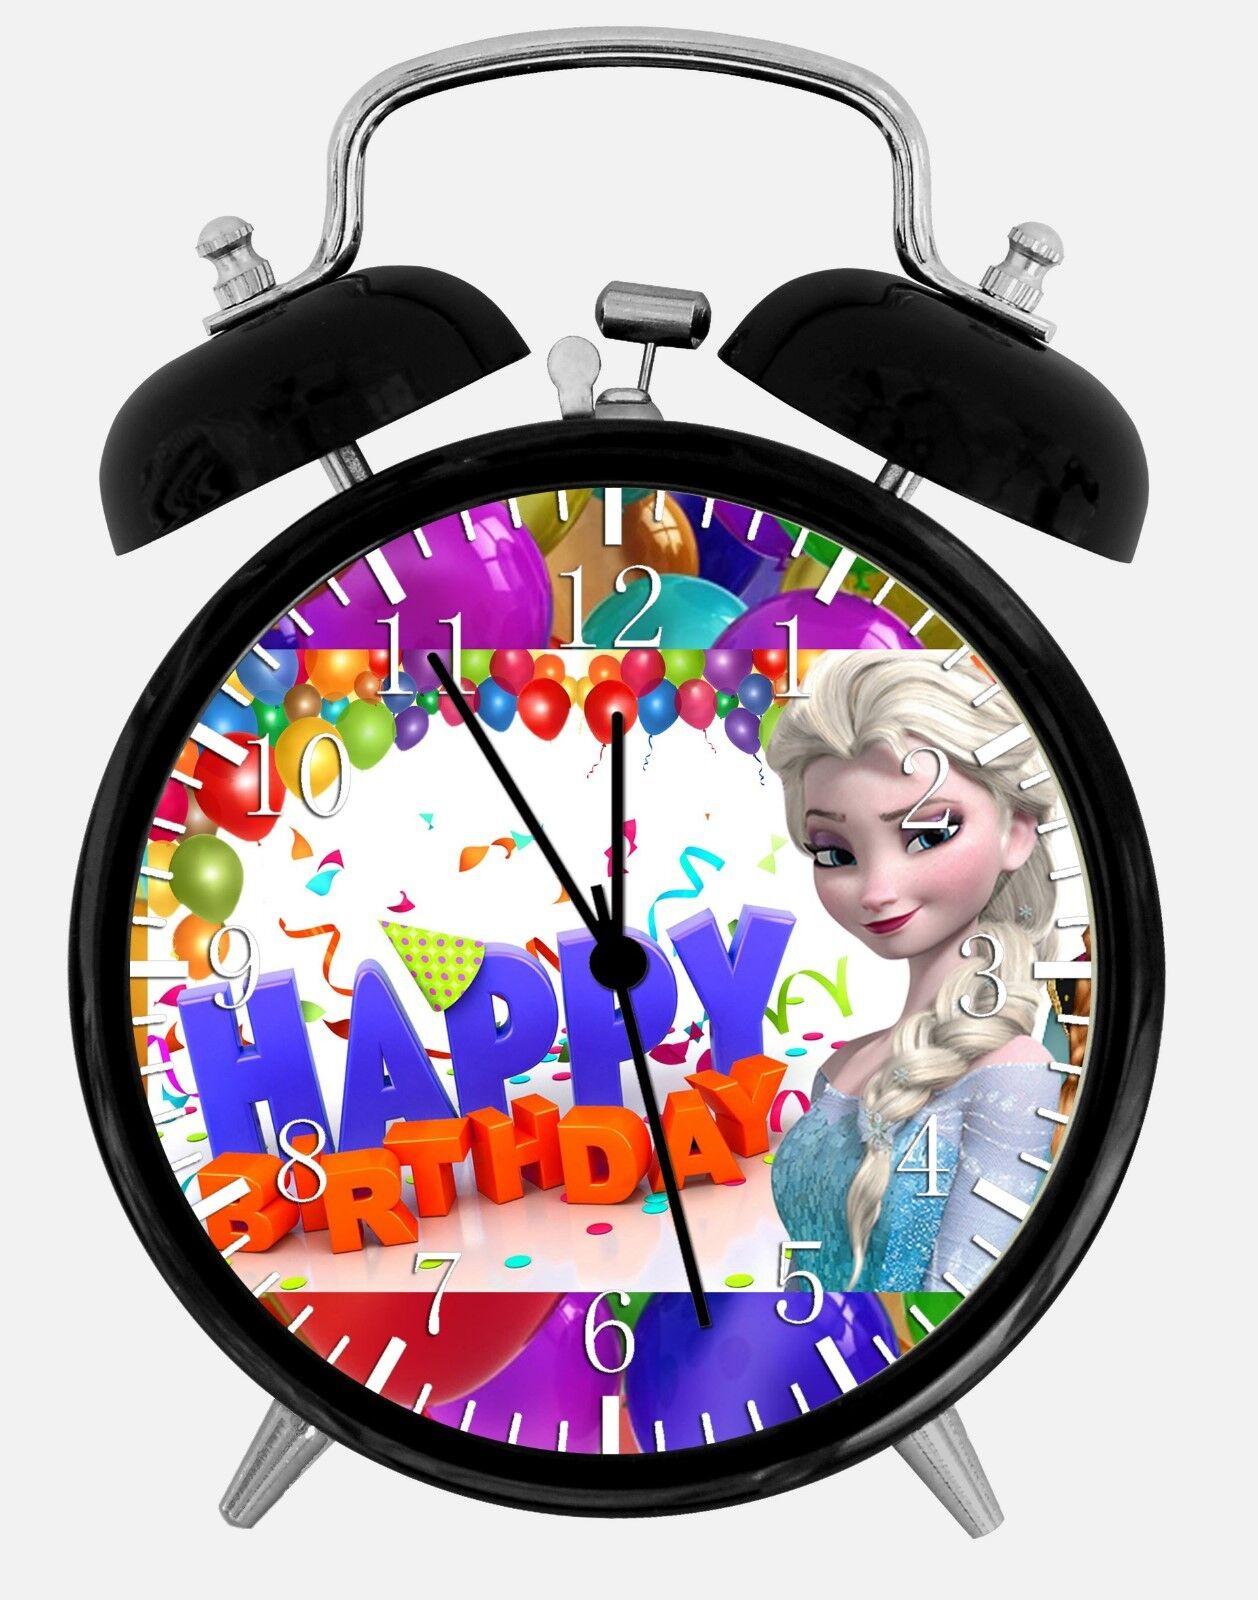 "Frozen Birthday Gift Alarm Desk Clock 3.75"" Home or Office Decor E300 Nice Gift"